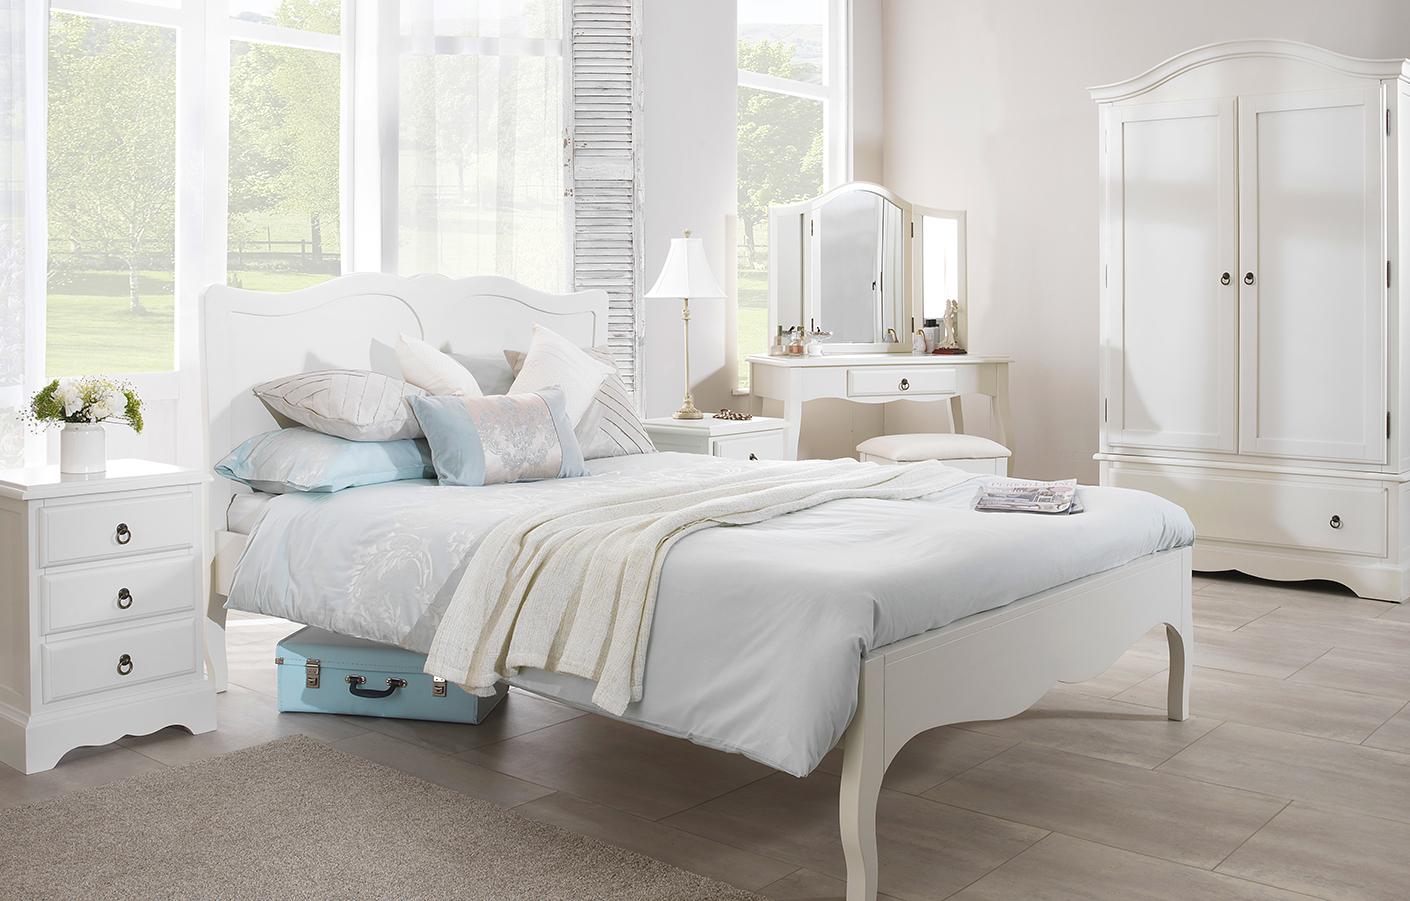 vintage bedroom furniture cream LLVRQVB - What Type Of Furniture Is Vintage Bedroom Furniture